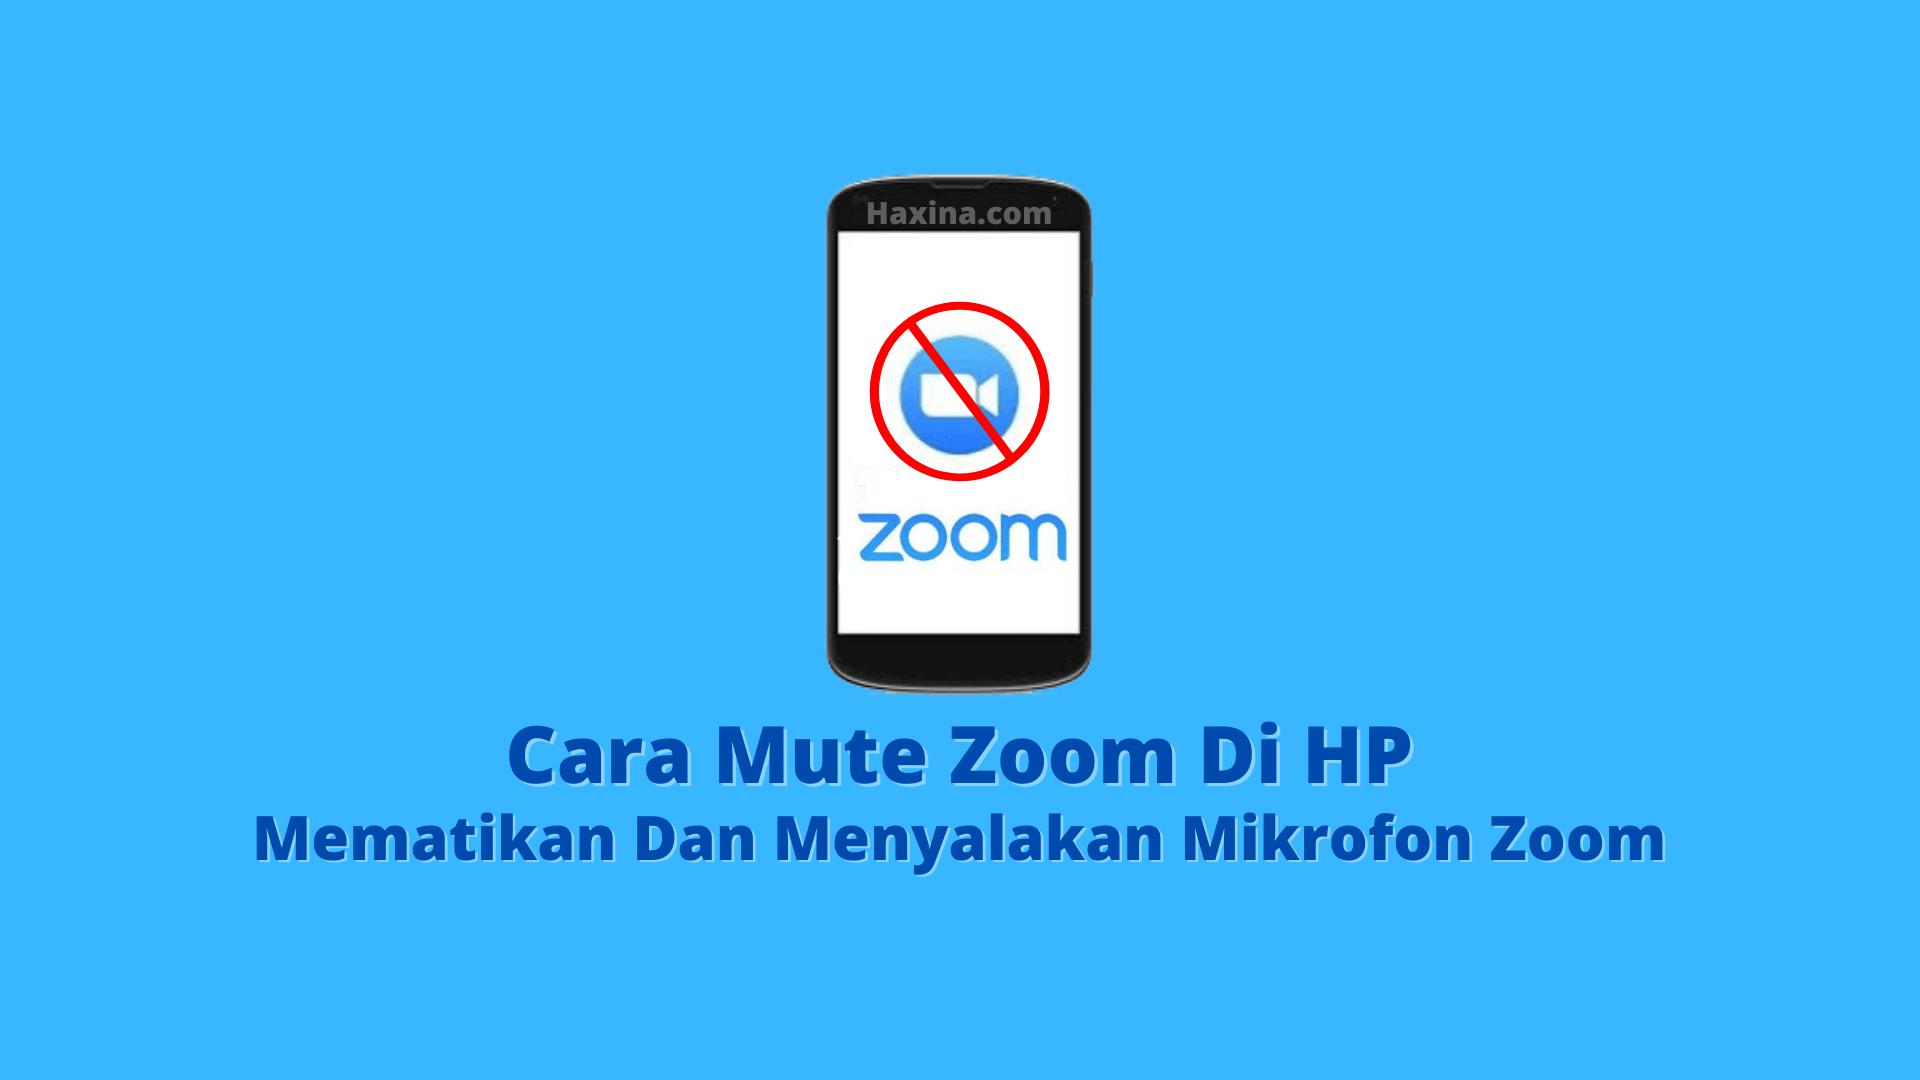 Cara Mute Zoom Di HP